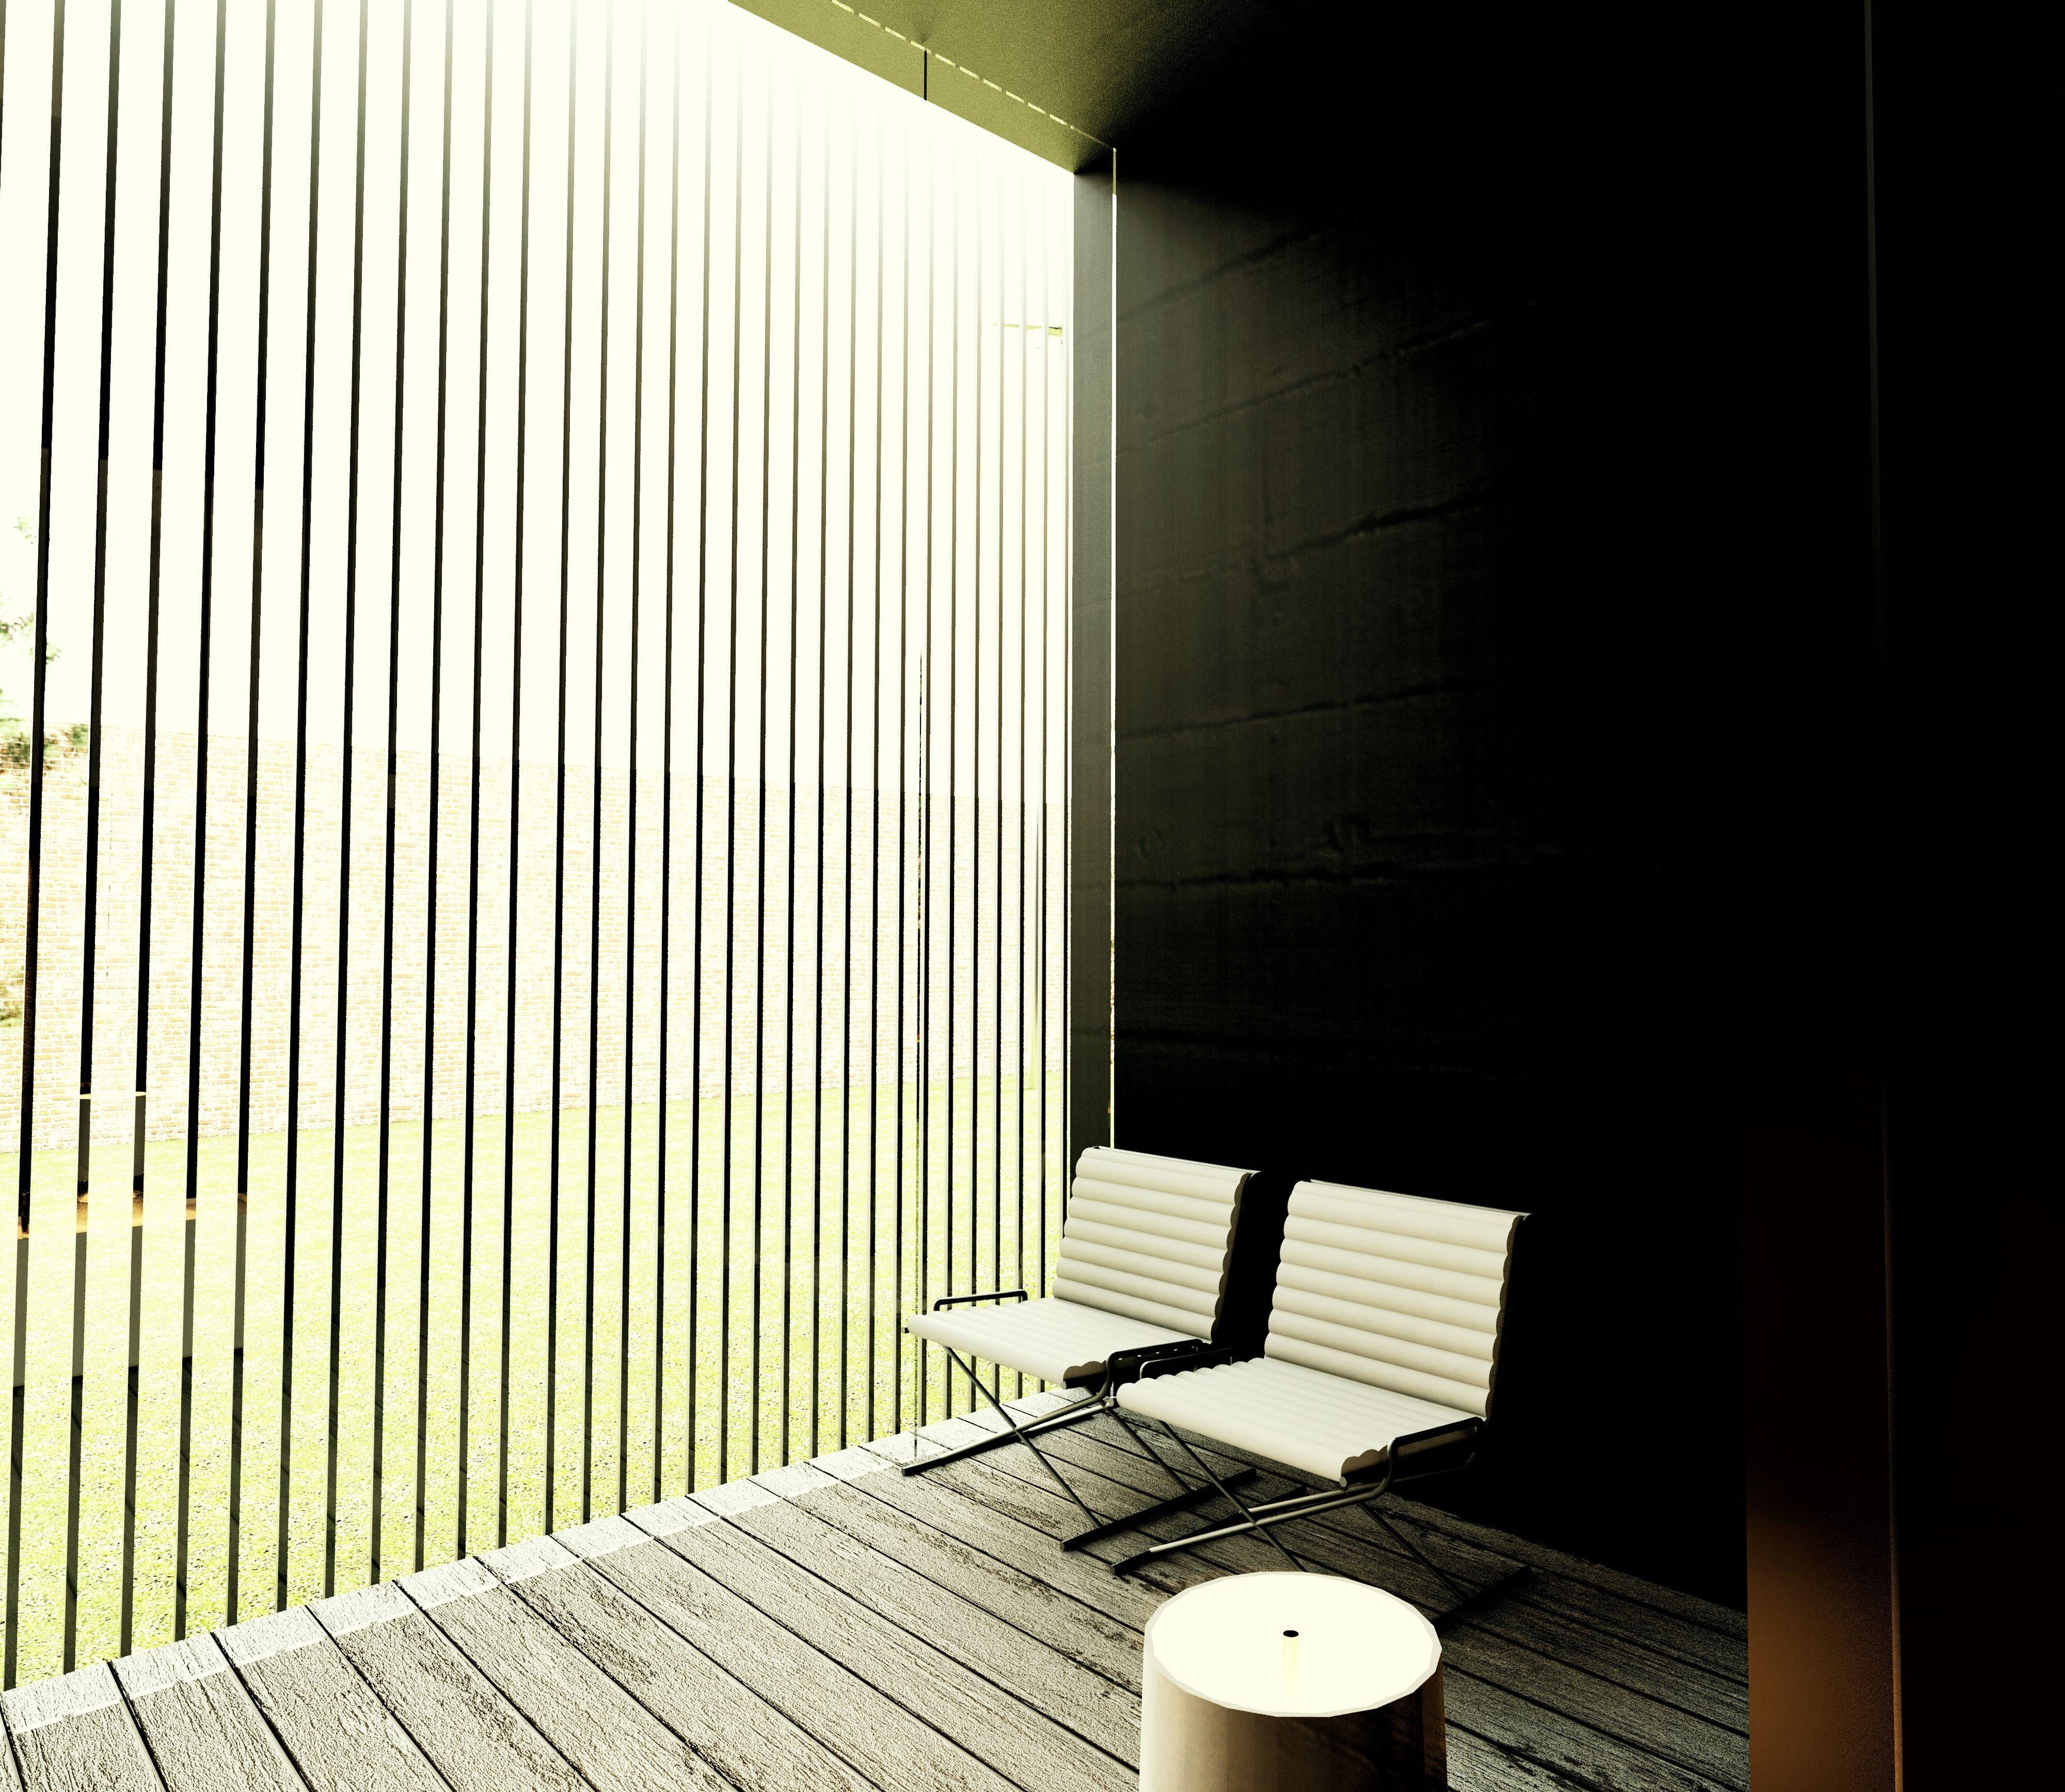 University-portfolio-house-961150-rvt-2016-sep-03-09-24-44am-000-3d-view-5-01-3500-3500